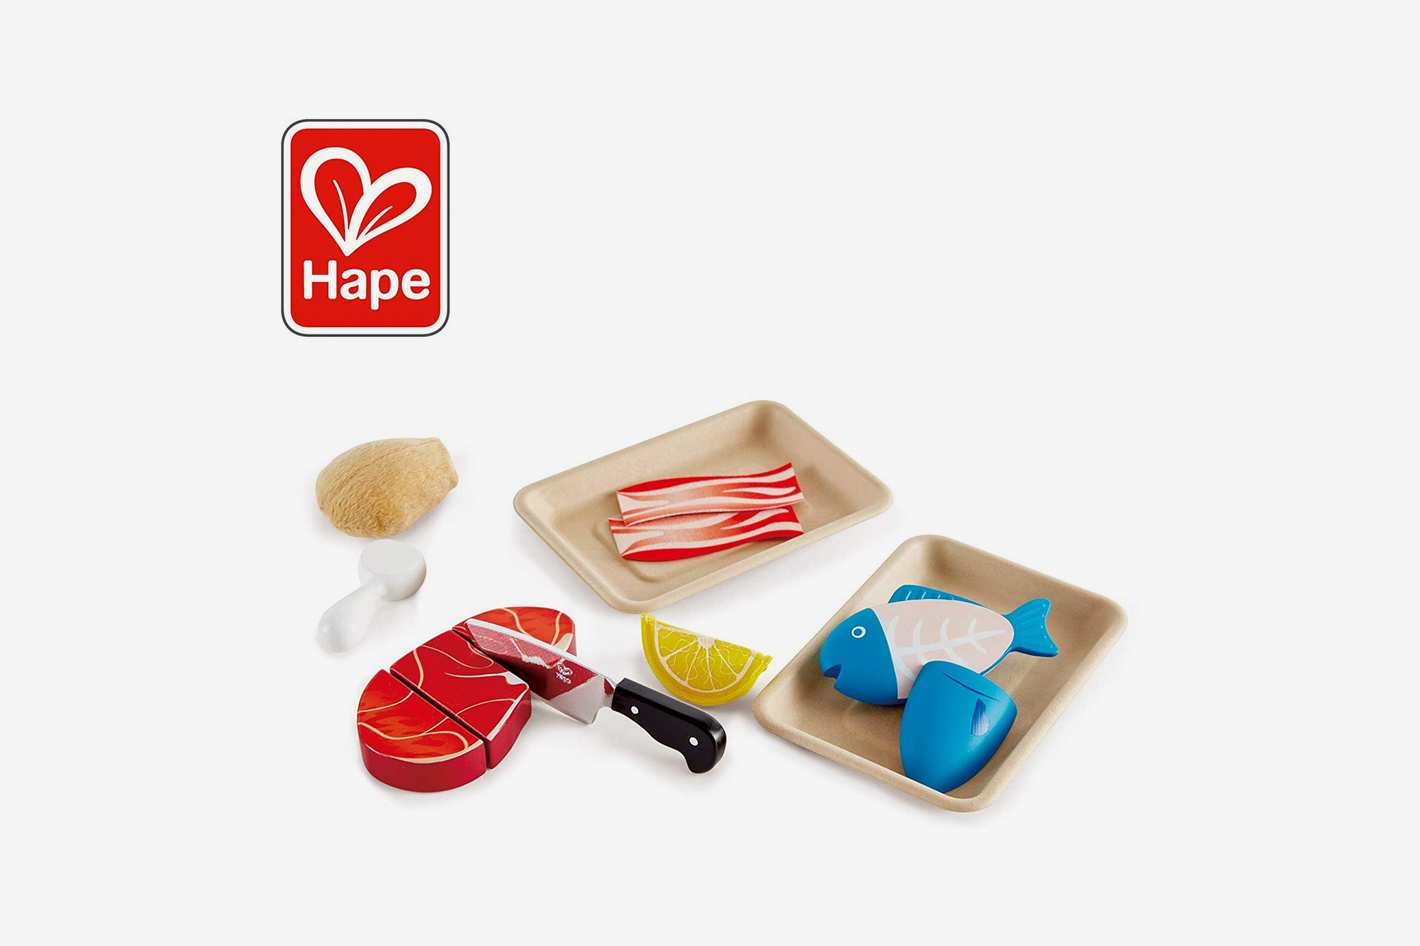 Hape Tasty Proteins Wooden Play Food Set